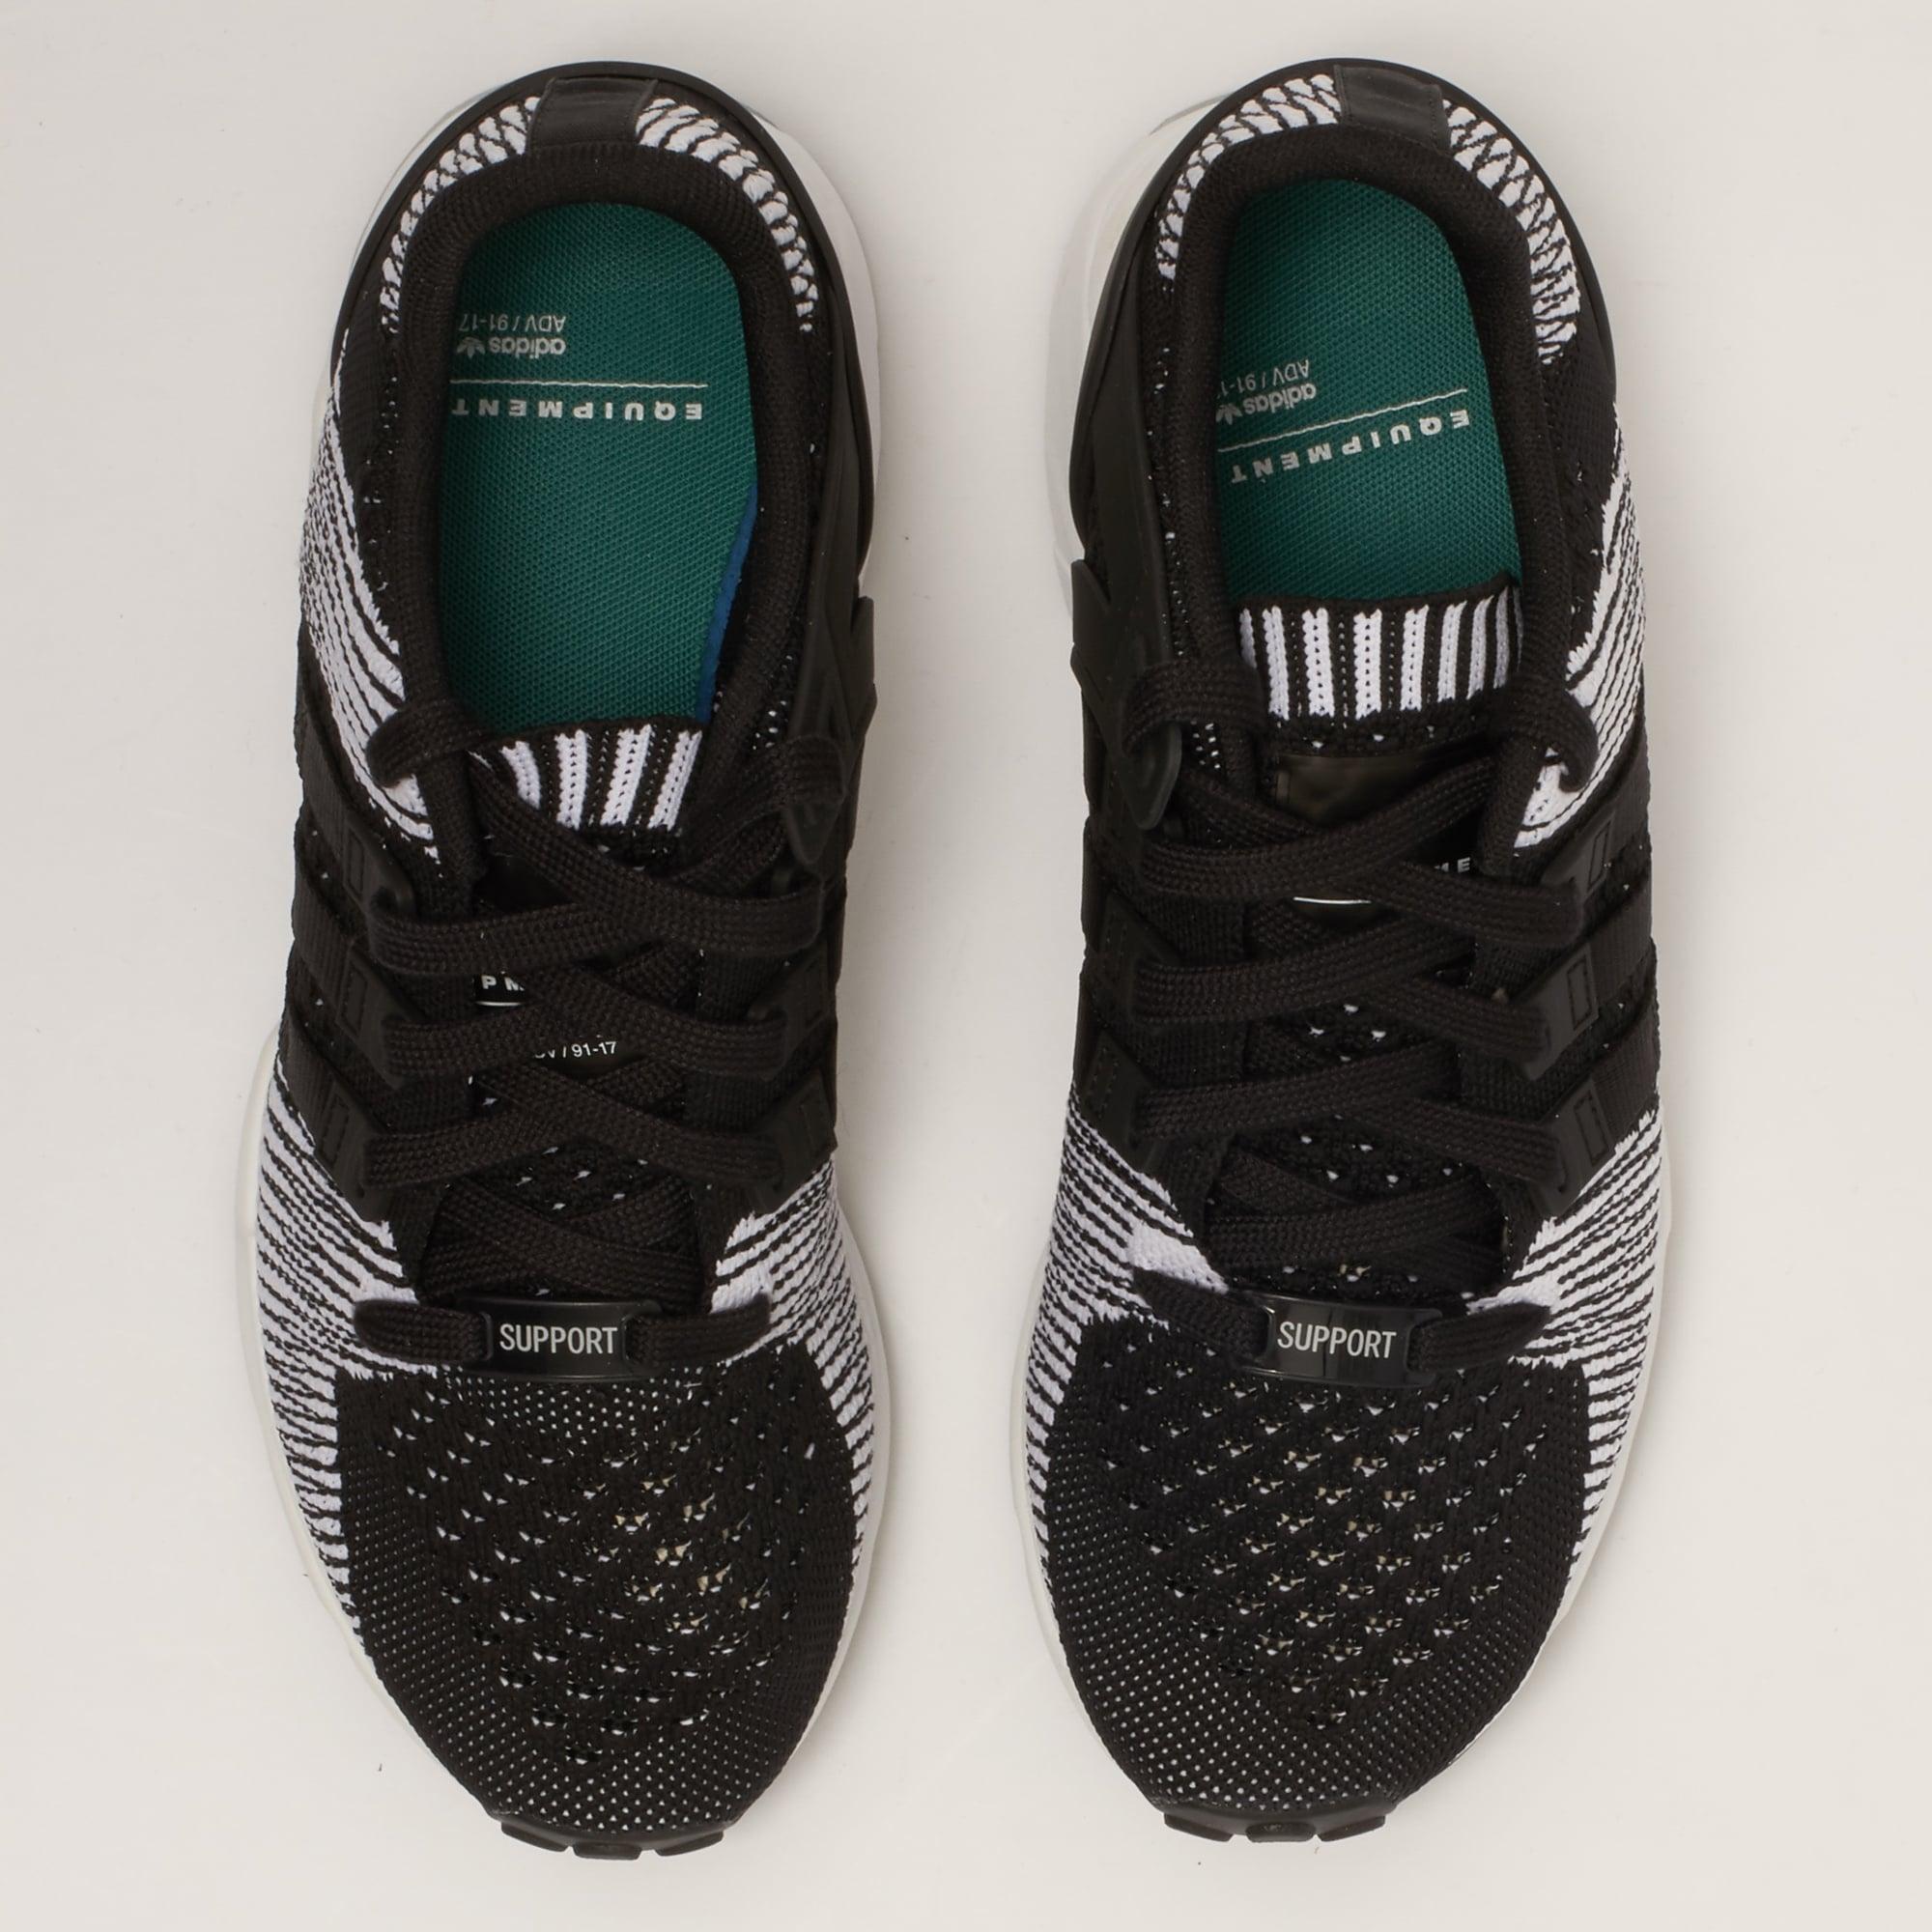 adidas Originals EQT Support RF Primeknit Core Black & FTW White